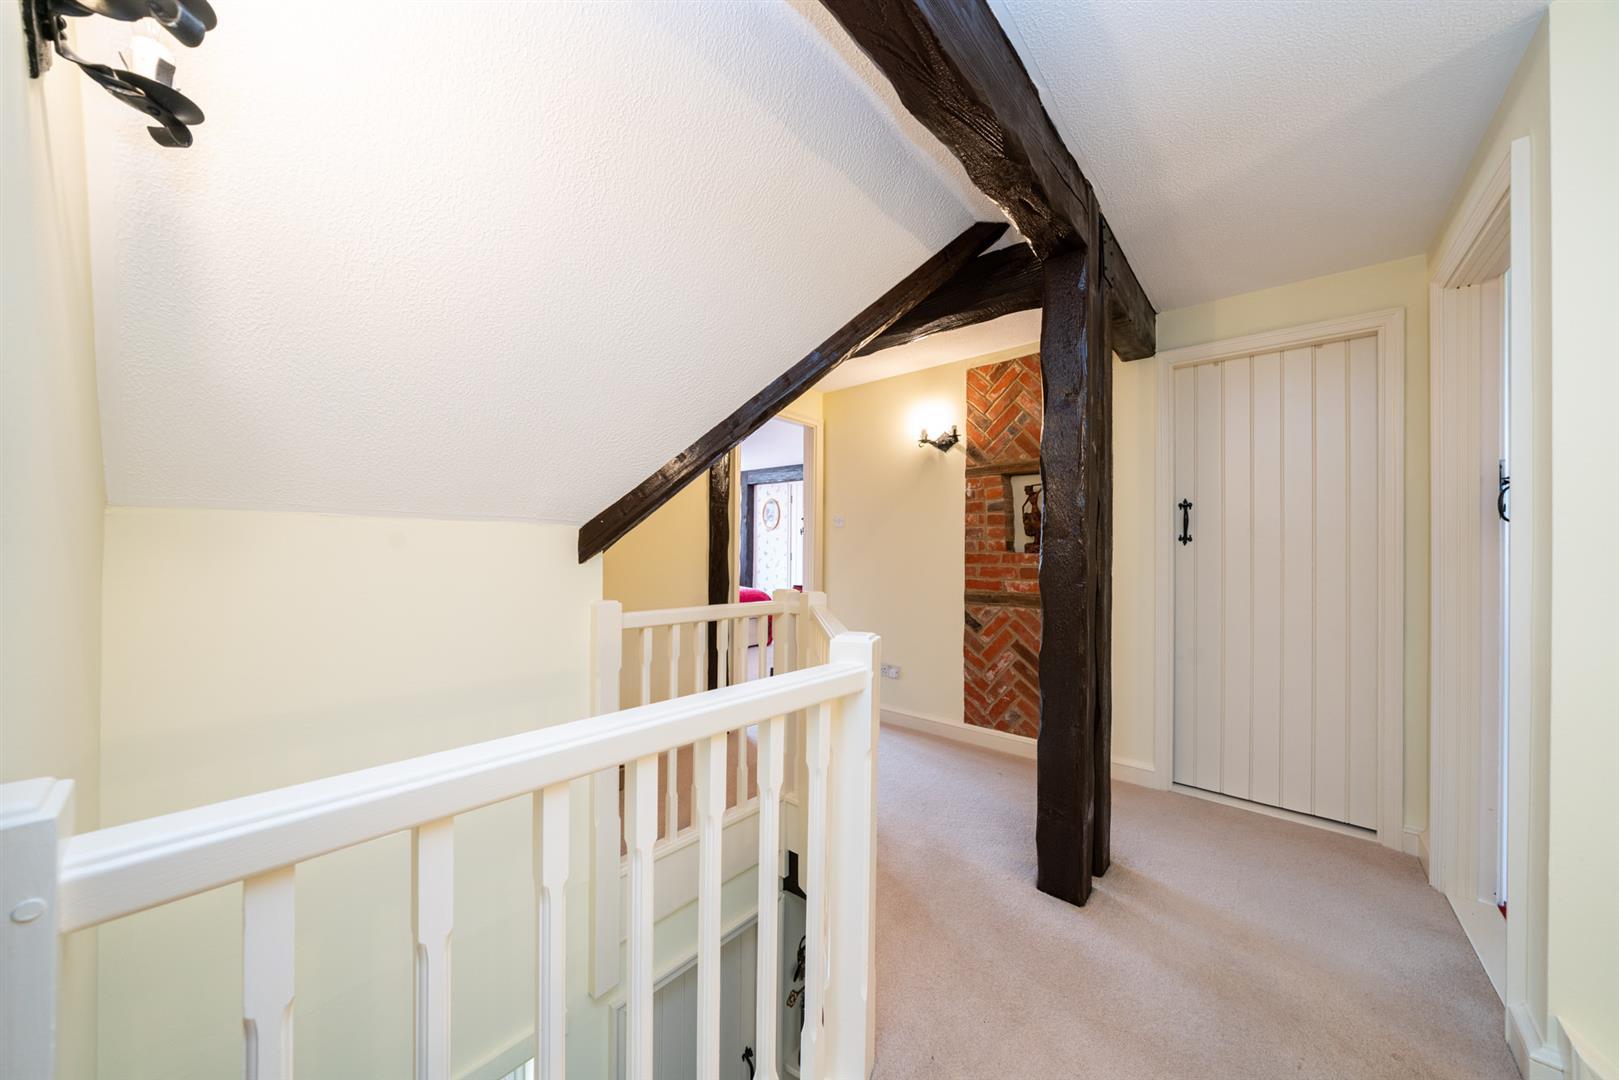 Woodlands-upstairs hall 2.jpg